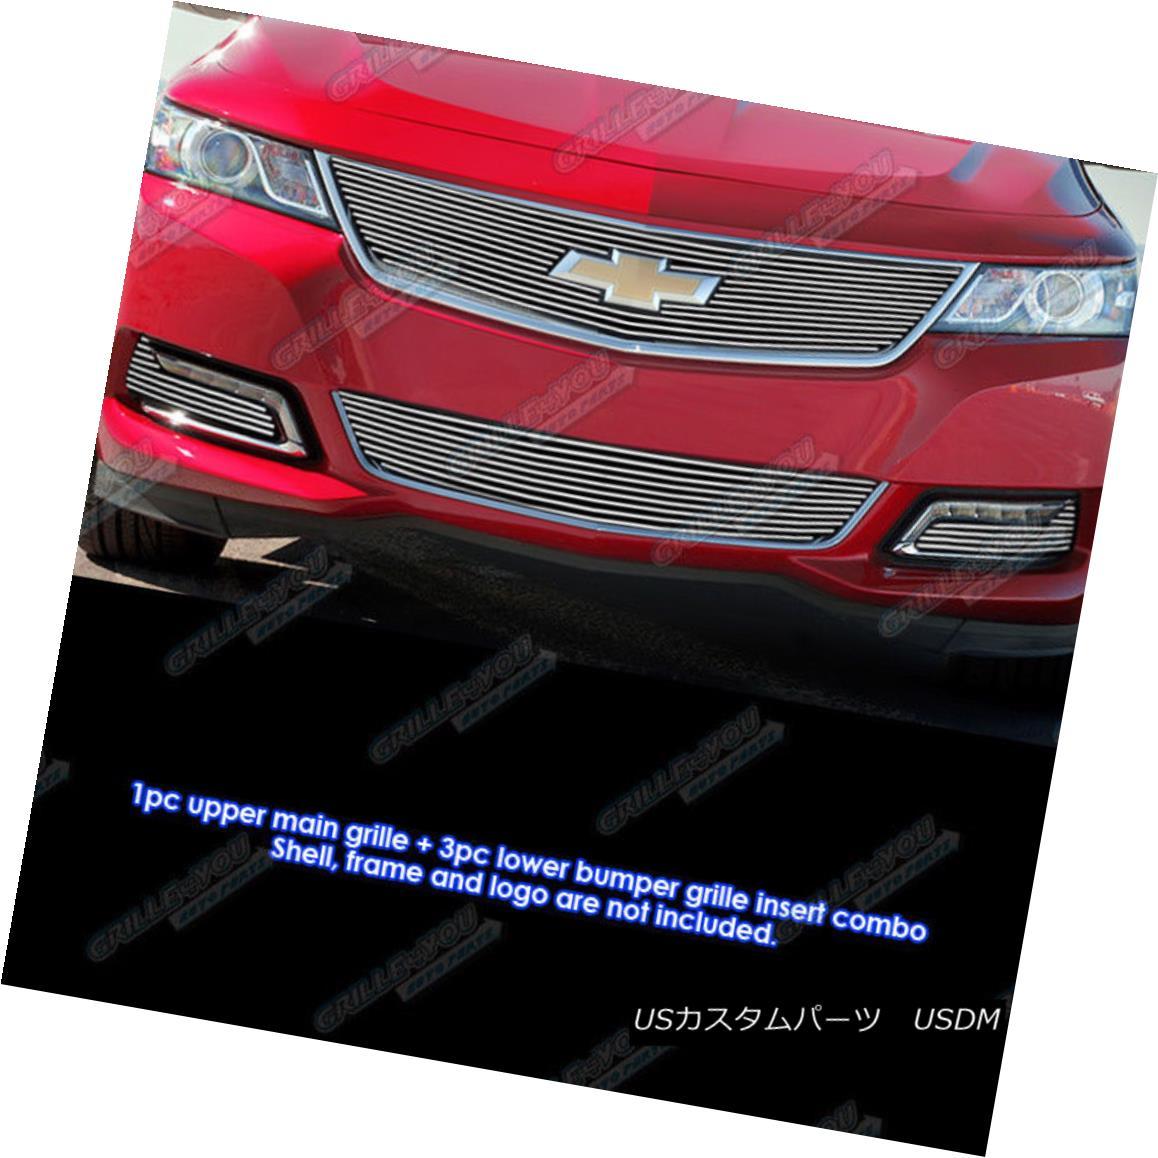 Fits 2014-2017 Chevy Impala LTZ Fog Light Cover Billet Grille Insert